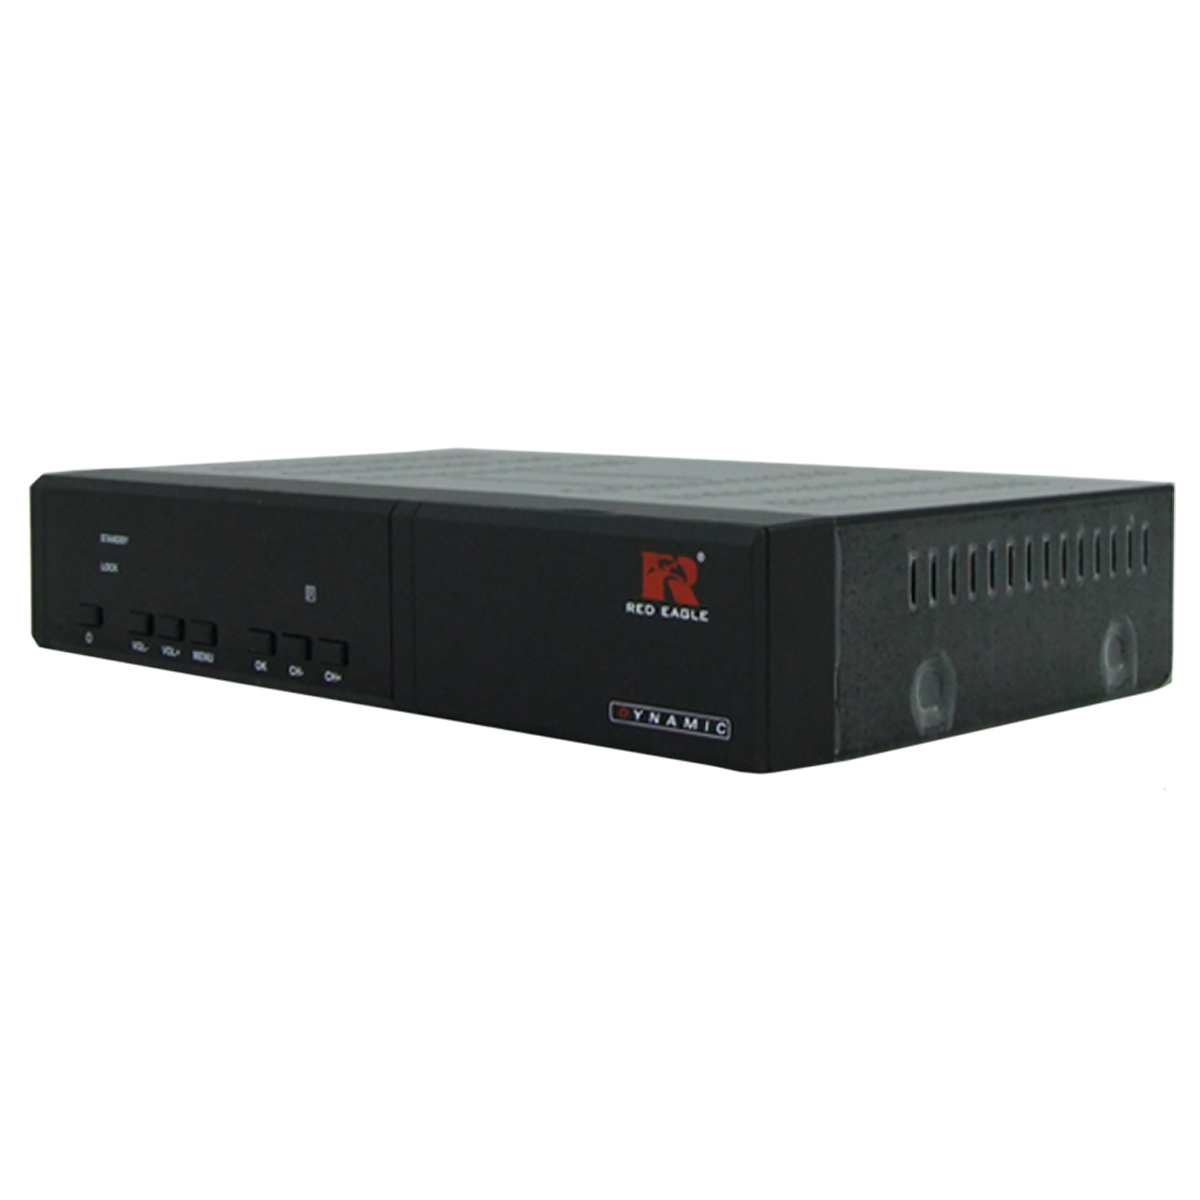 red eagle dynamic full hd sat receiver hdmi 1080p scart usb iptv media player. Black Bedroom Furniture Sets. Home Design Ideas